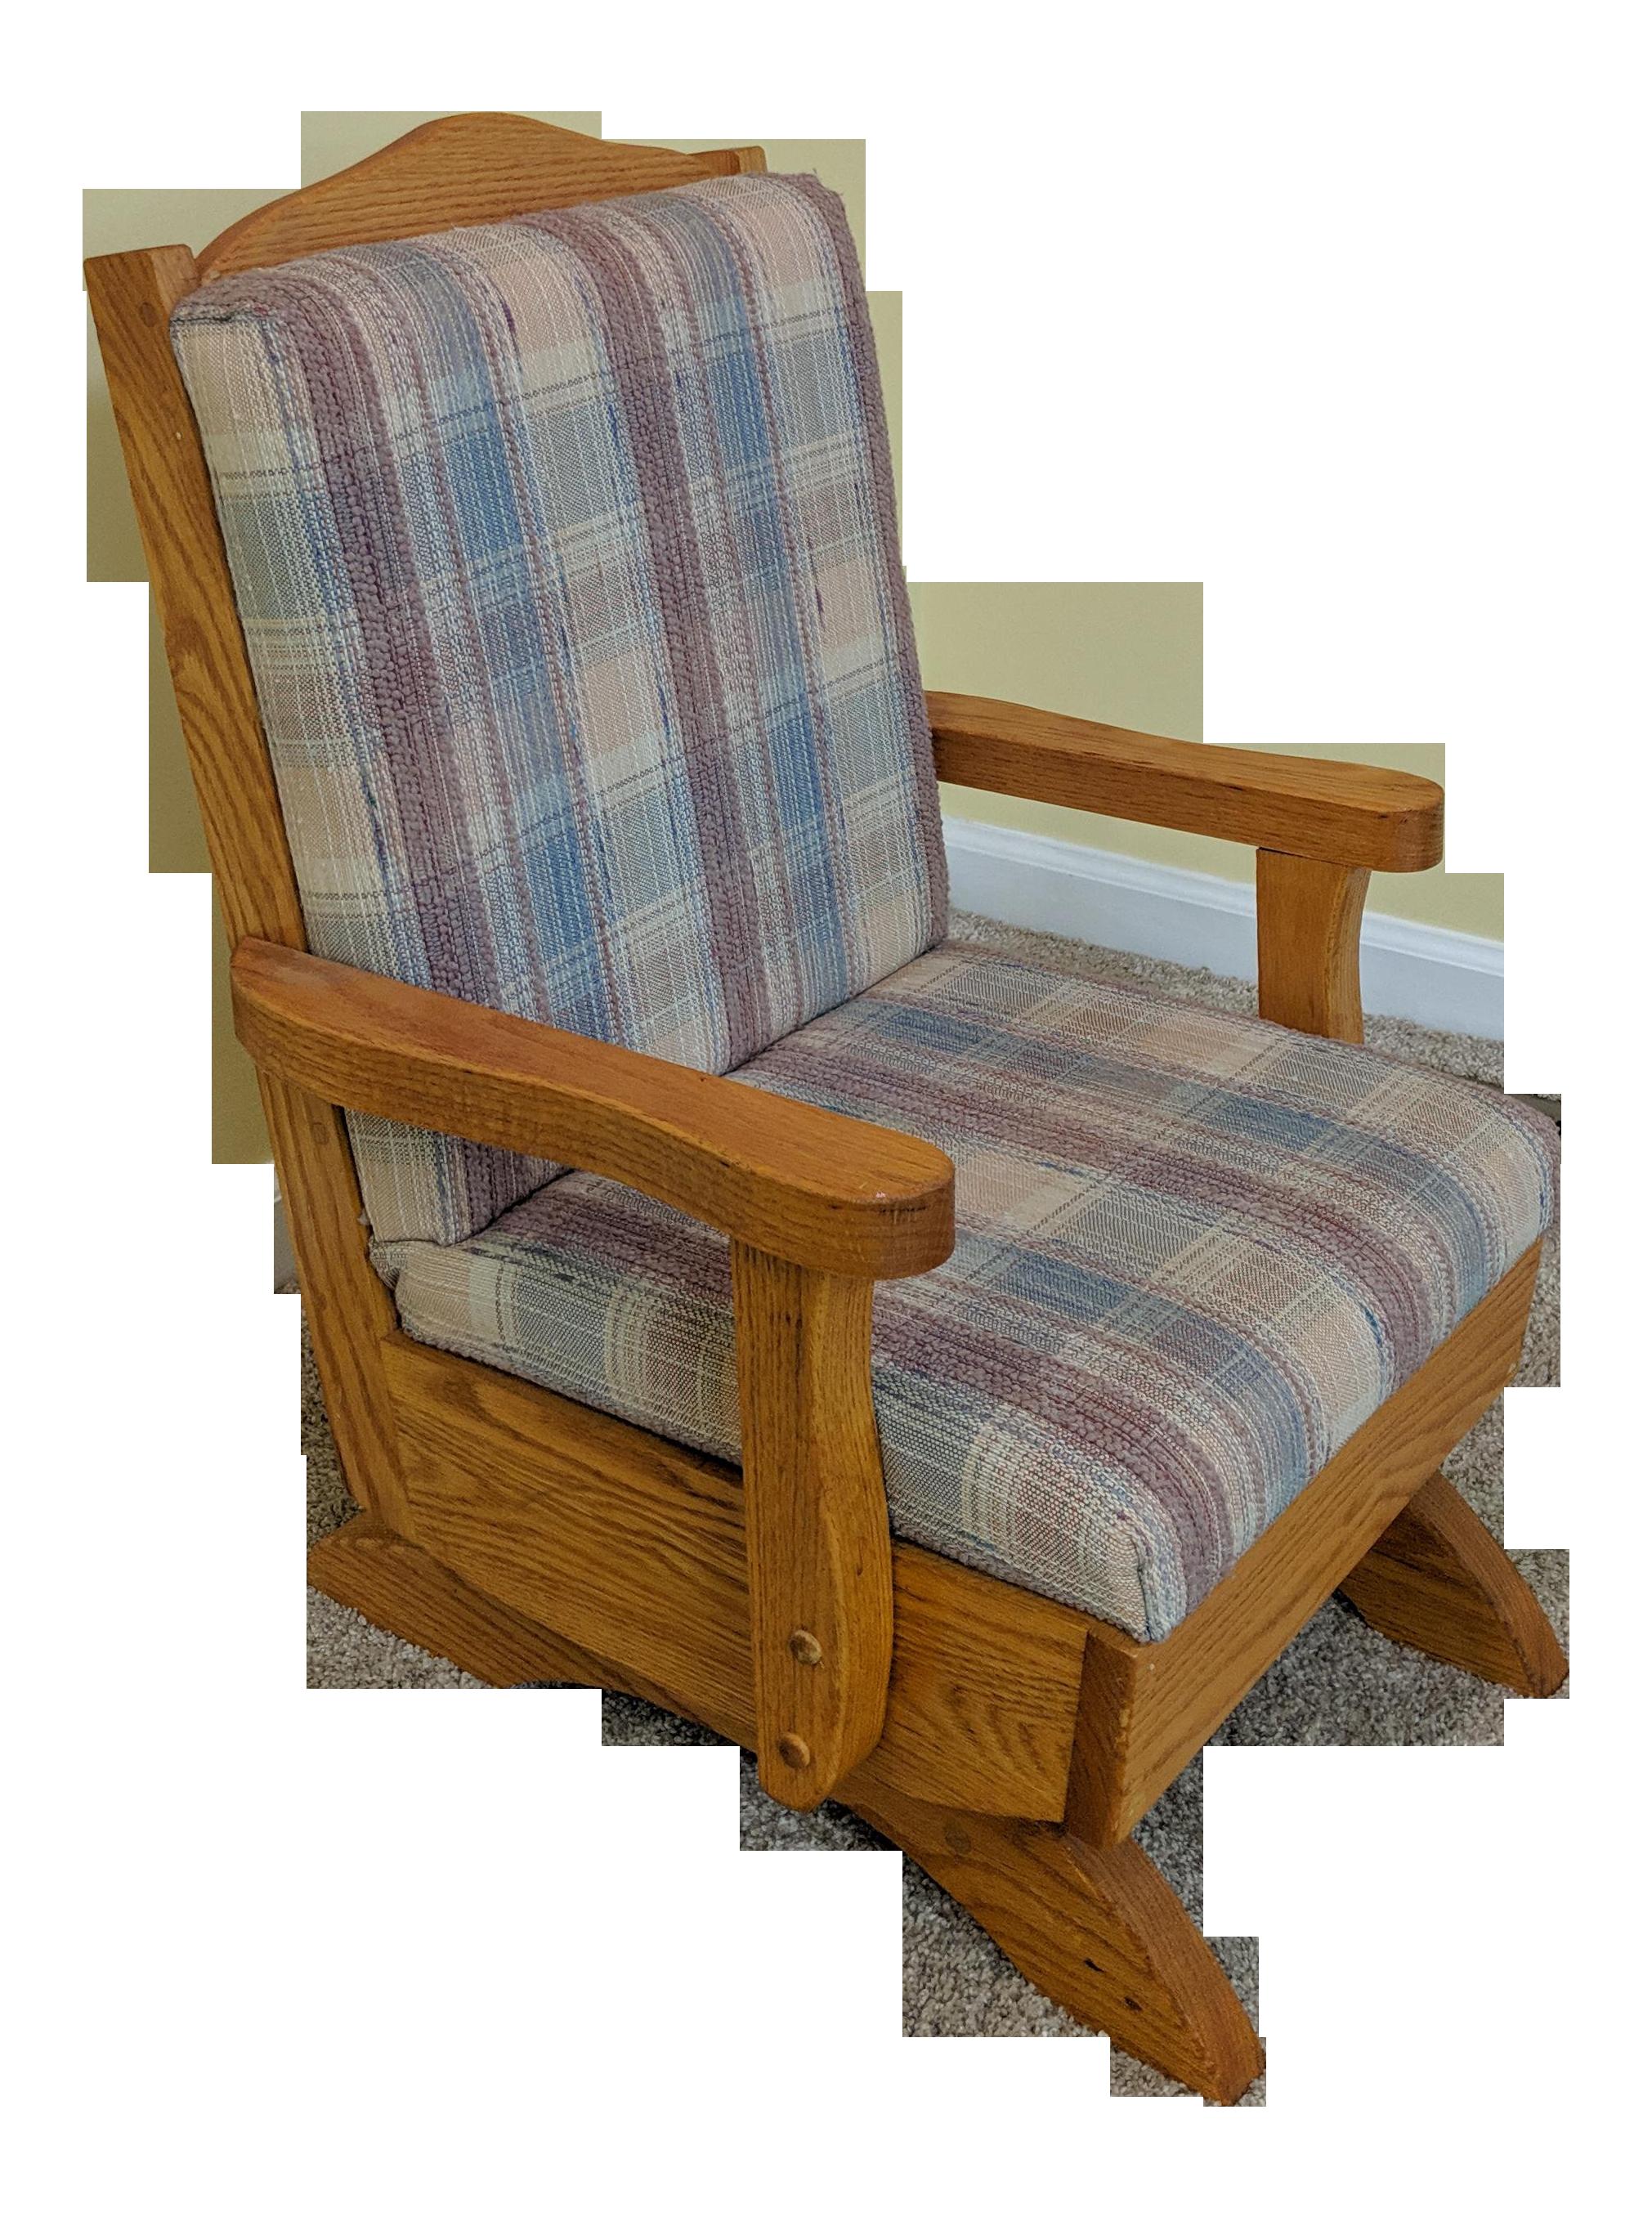 1980s Vintage Childrenu0027s Cushioned Wood Rocking Chair For Sale  sc 1 st  Chairish & Vintage u0026 Used Rocking Chairs for Sale | Chairish